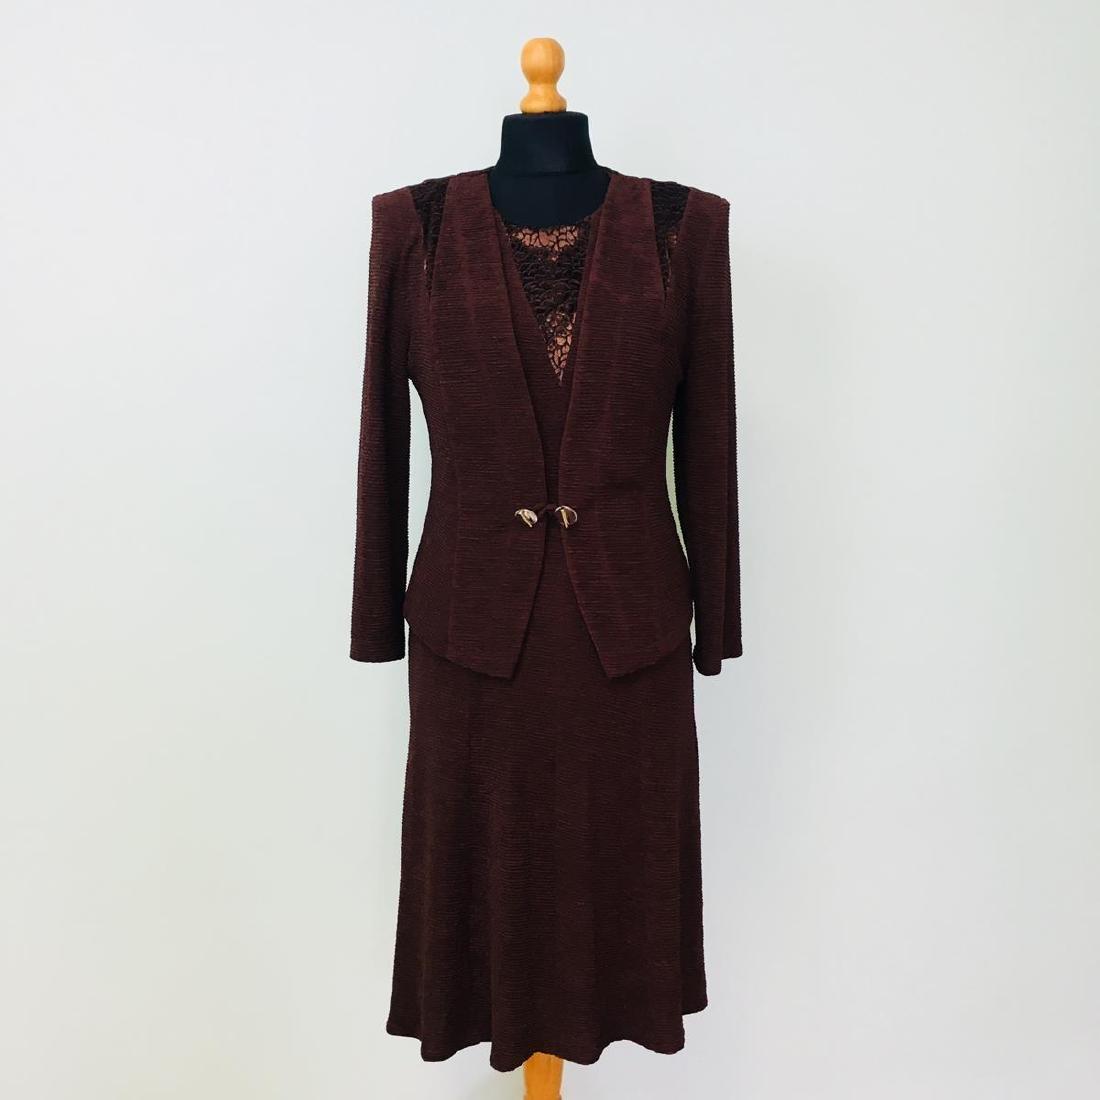 Vintage Women's 2 Piece Evening Jacket Dress Size M